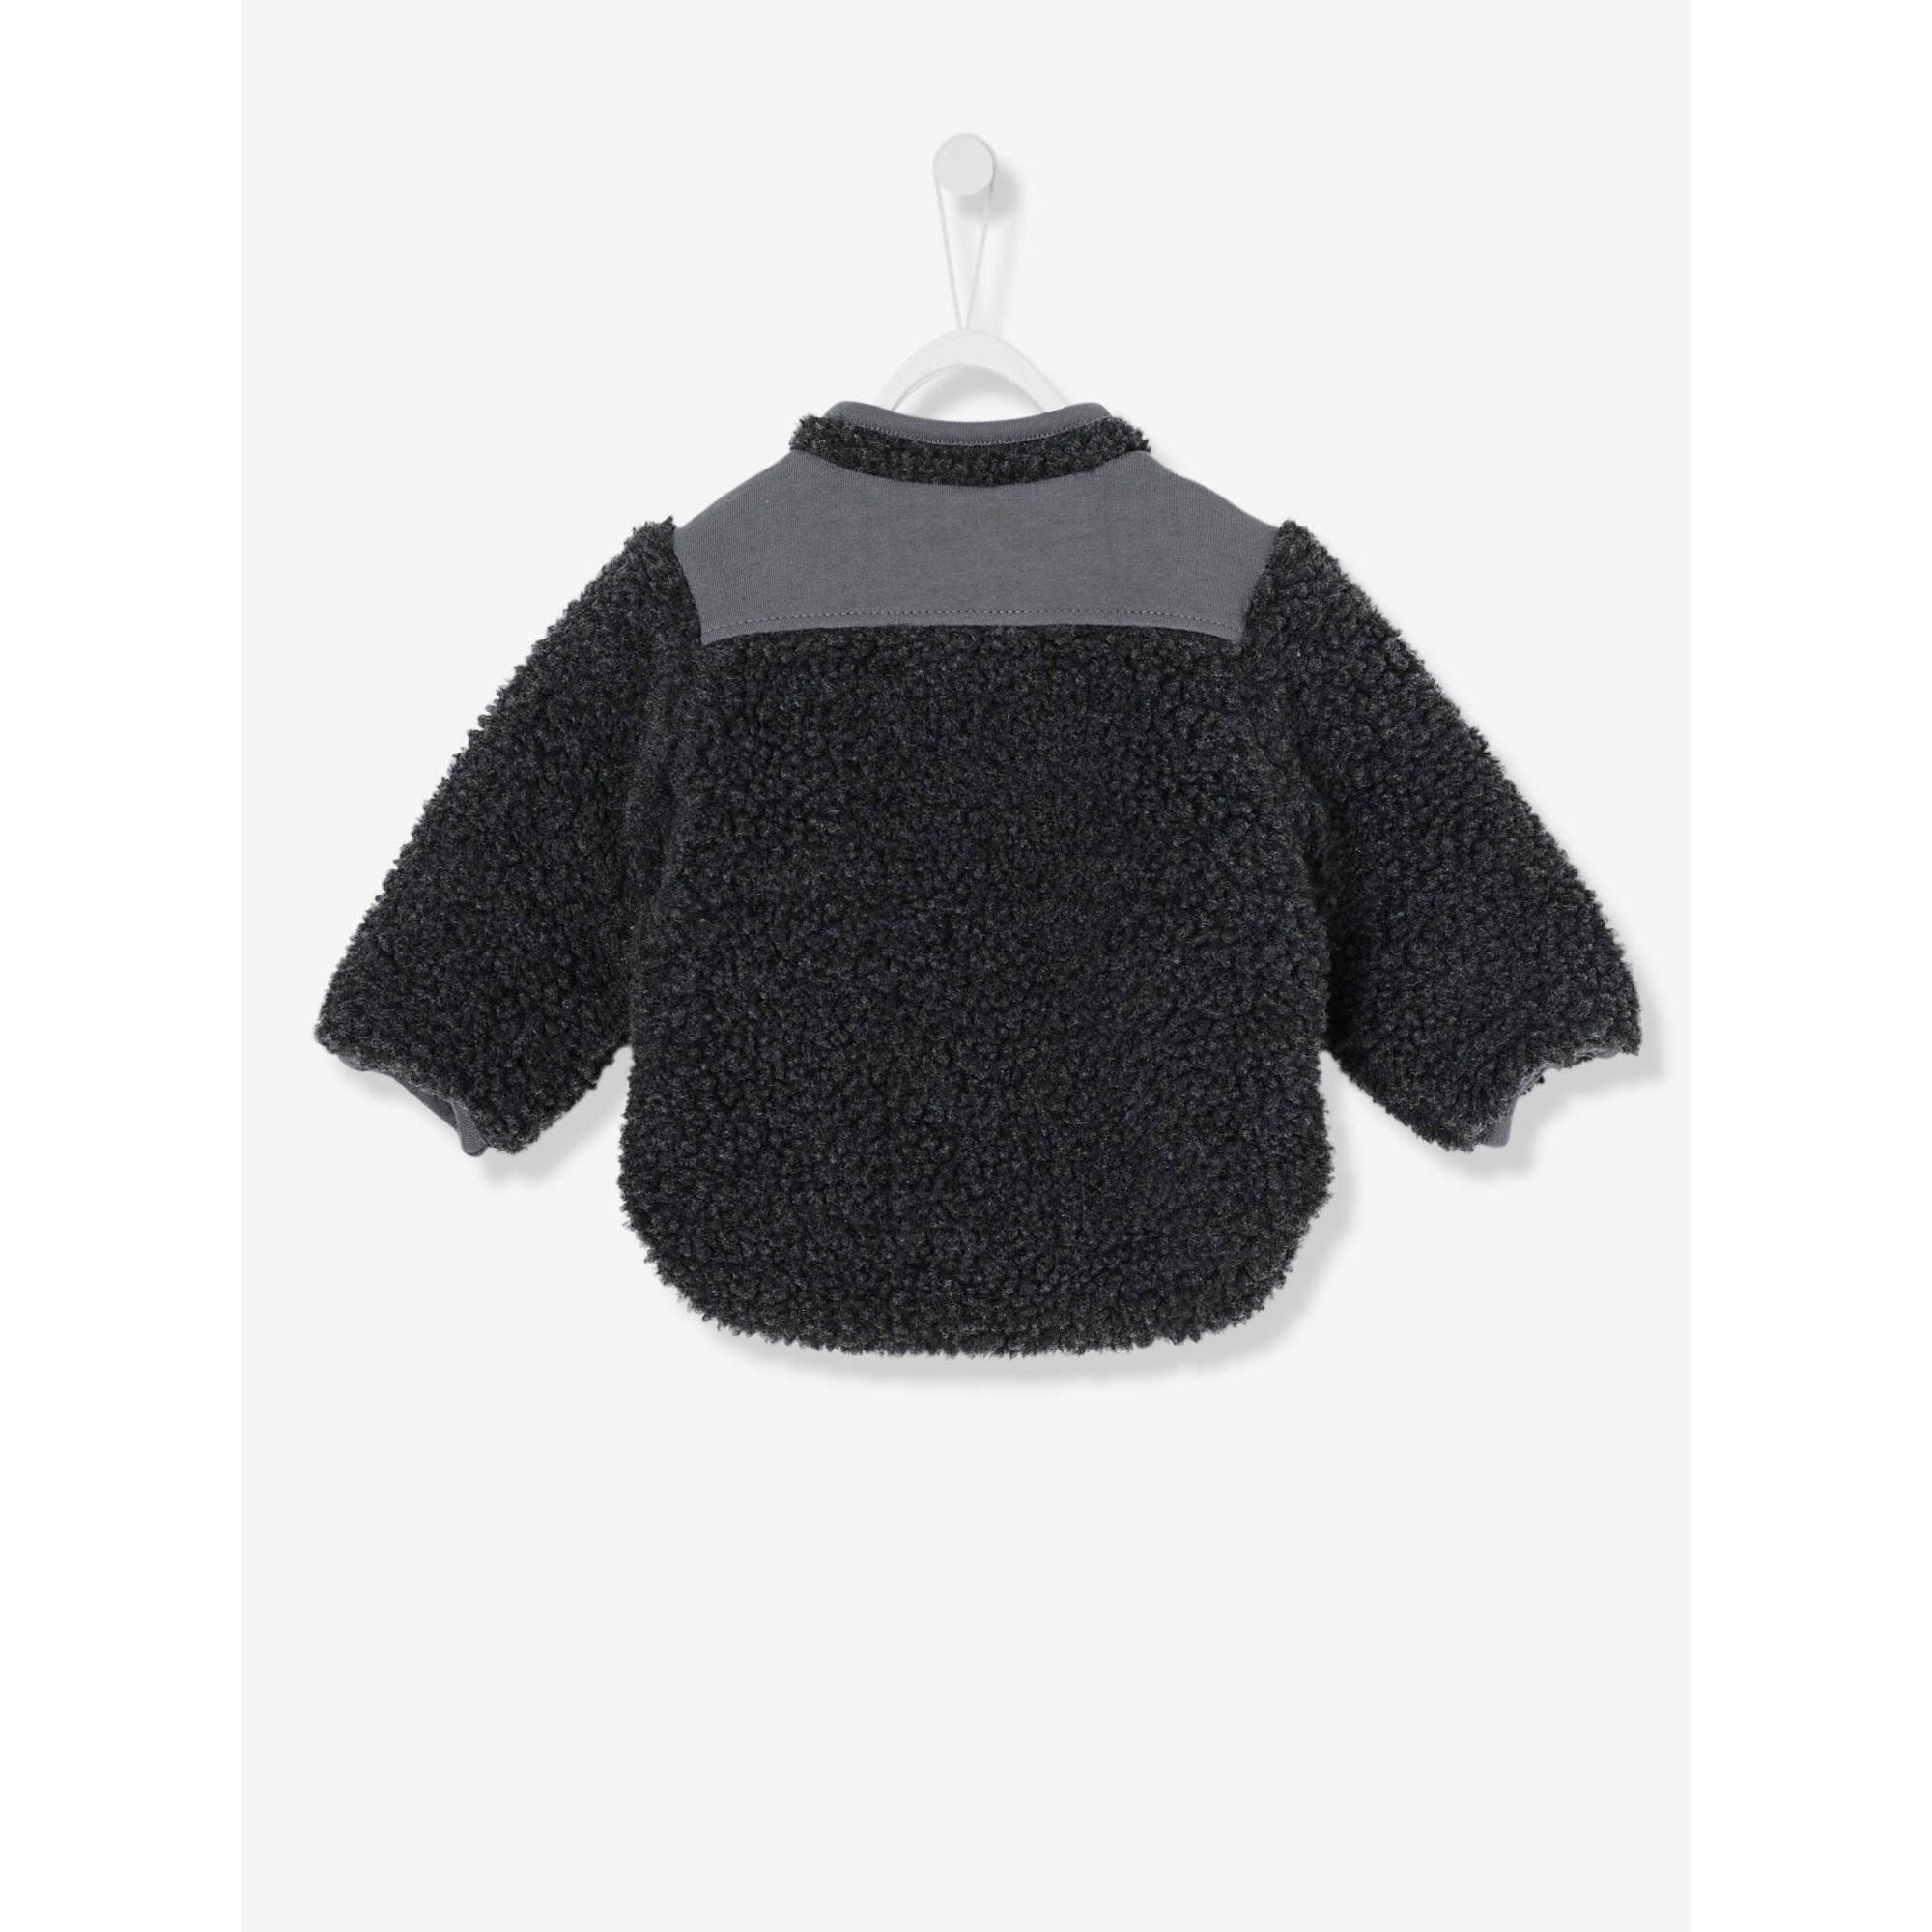 vertbaudet-cardigan-fur-baby-jungen-teddyfleece, 23.99 EUR @ babywalz-de